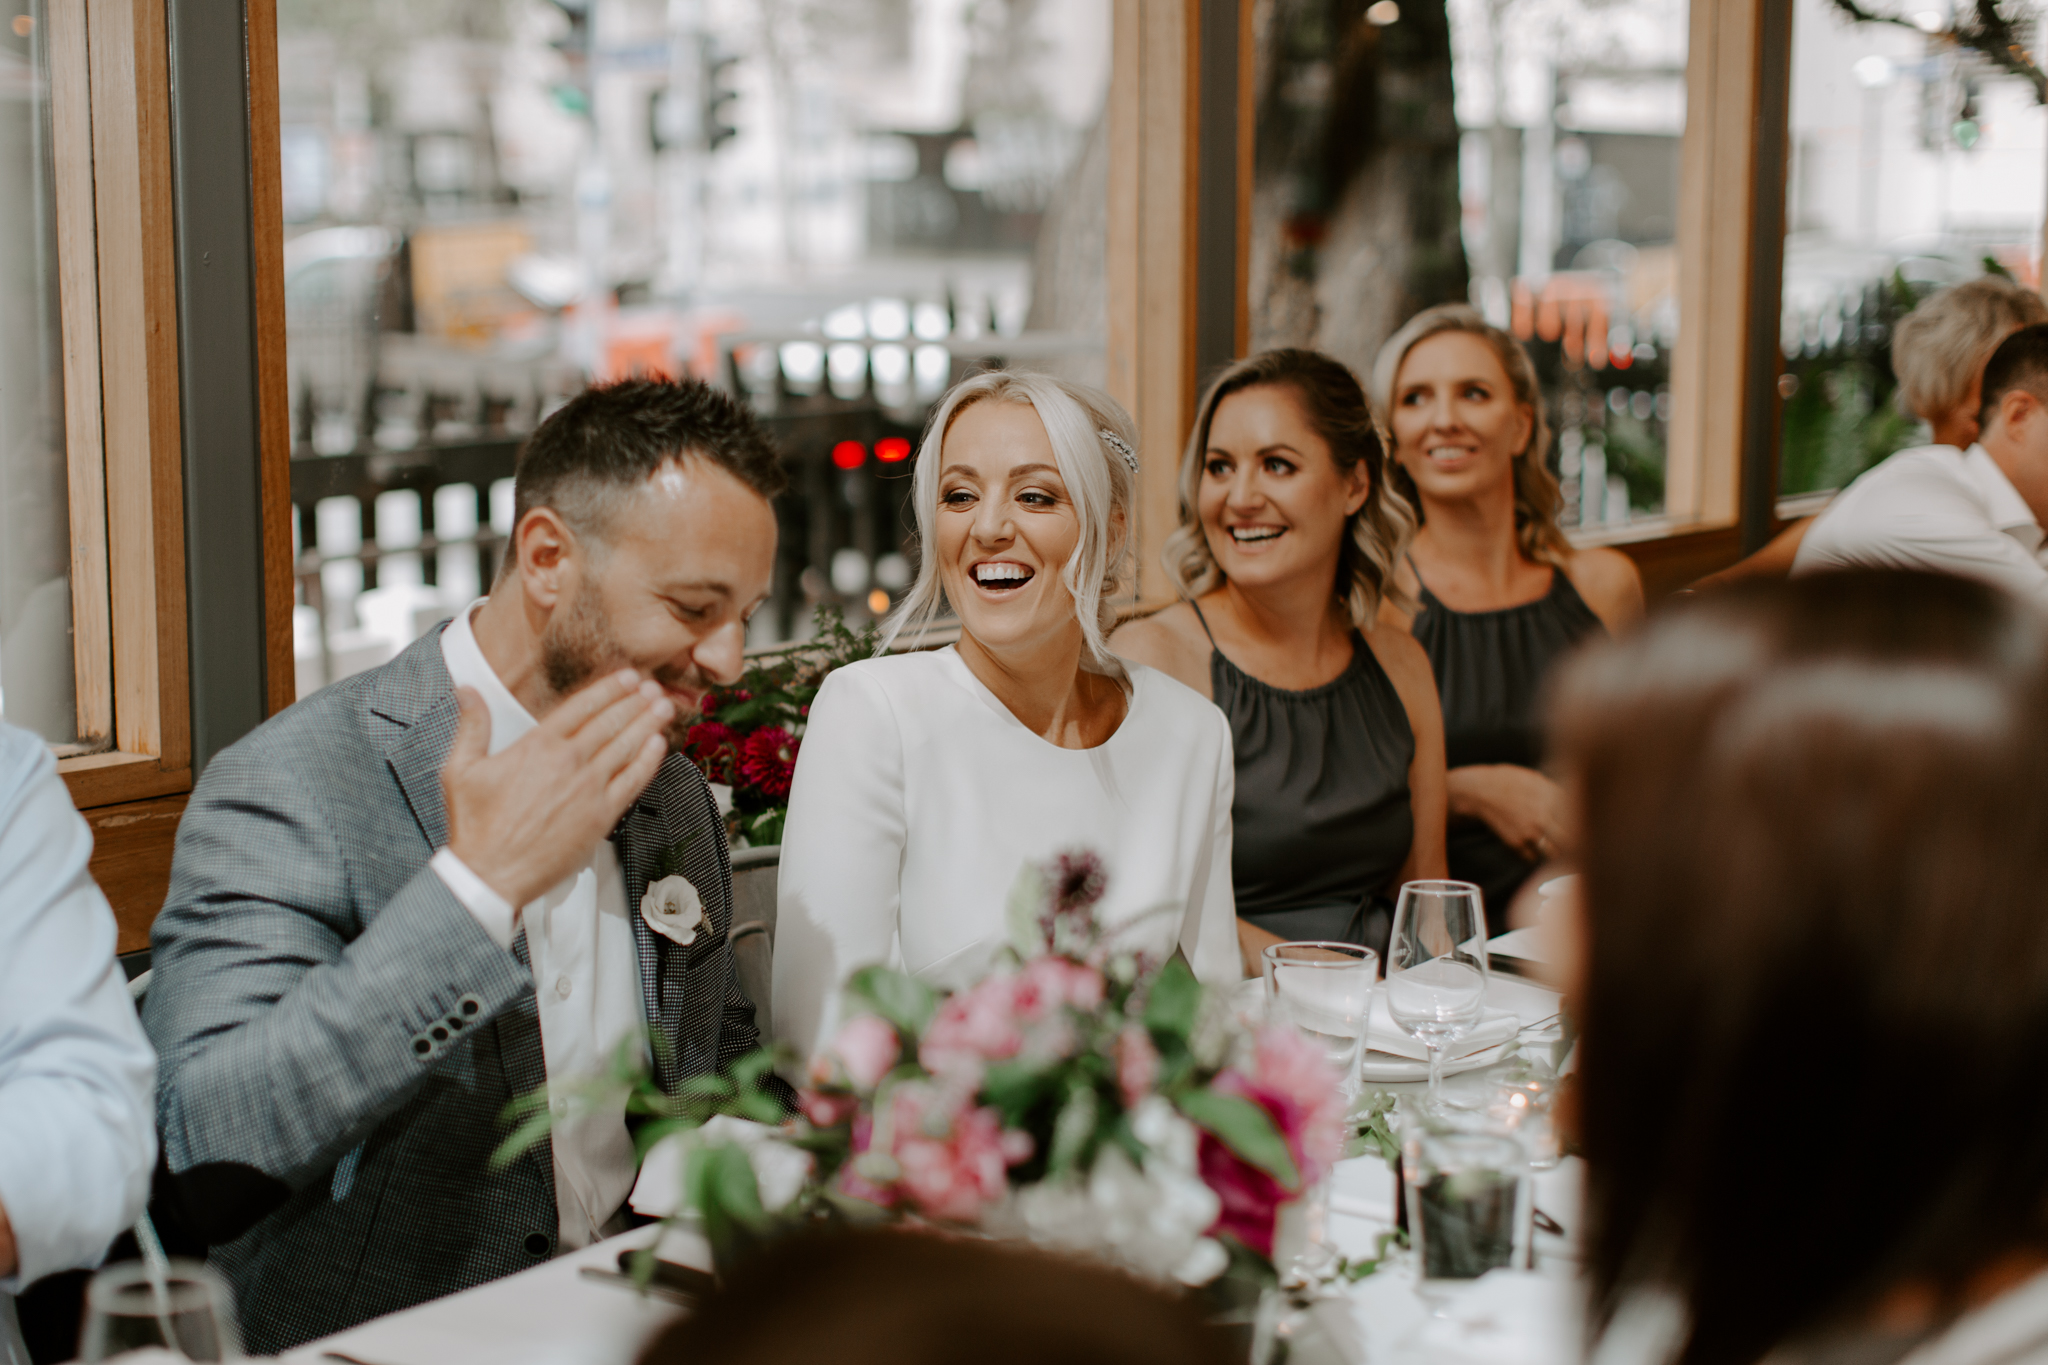 Trunk-restaurant-wedding-EmotionsandMath-064.jpg